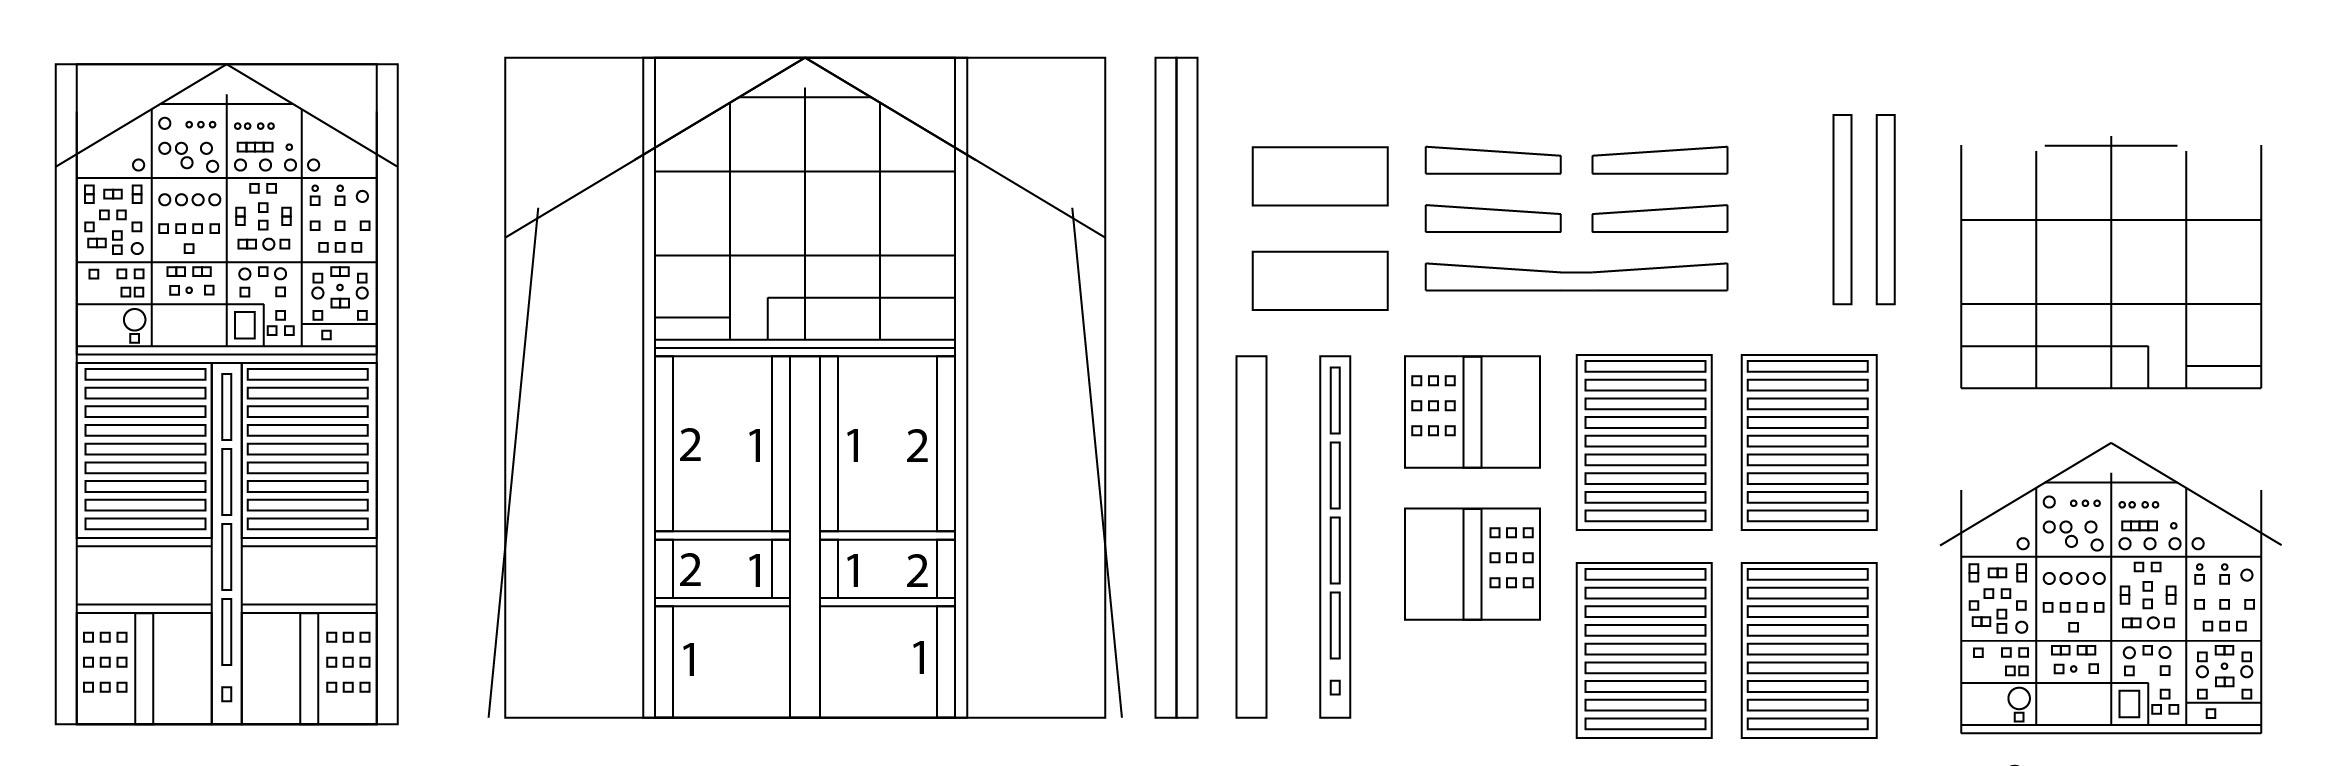 Cabin - cockpit - drawings 5.jpg